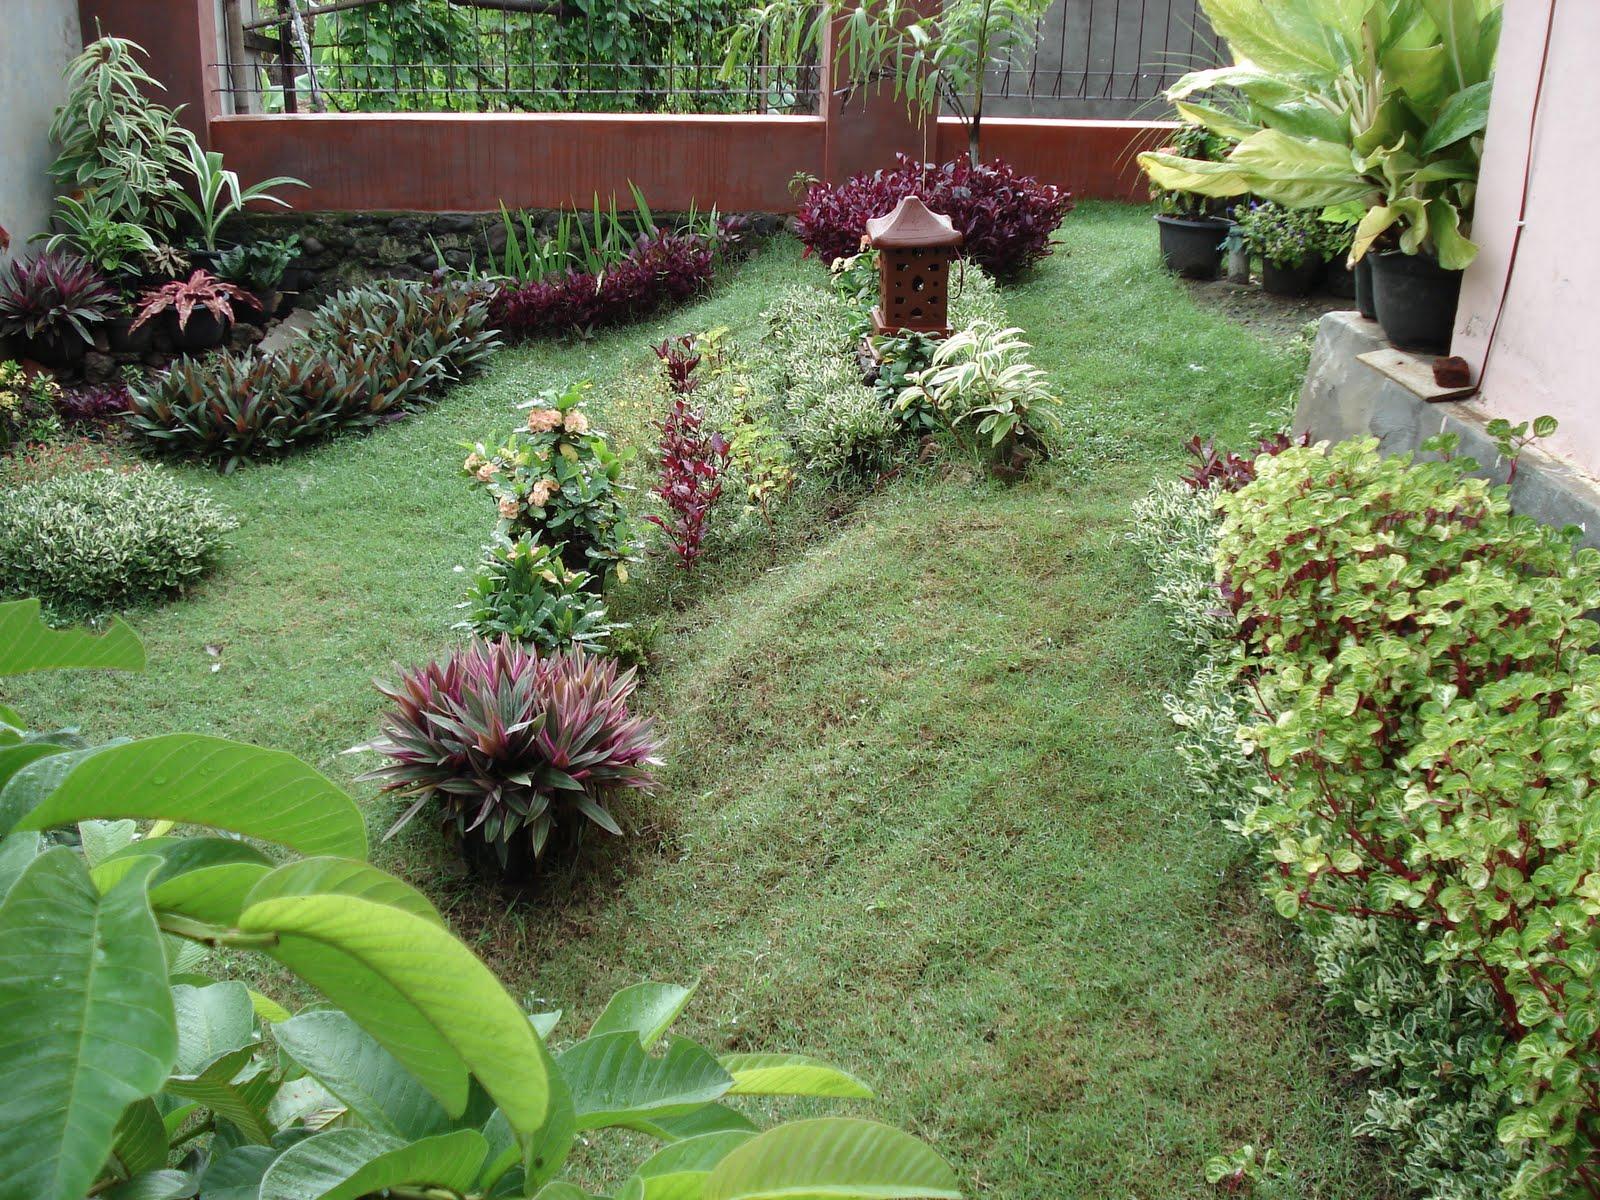 Taman Minimalis Modern Taman Kering Taman Mediterania Taman Bali Taman ...